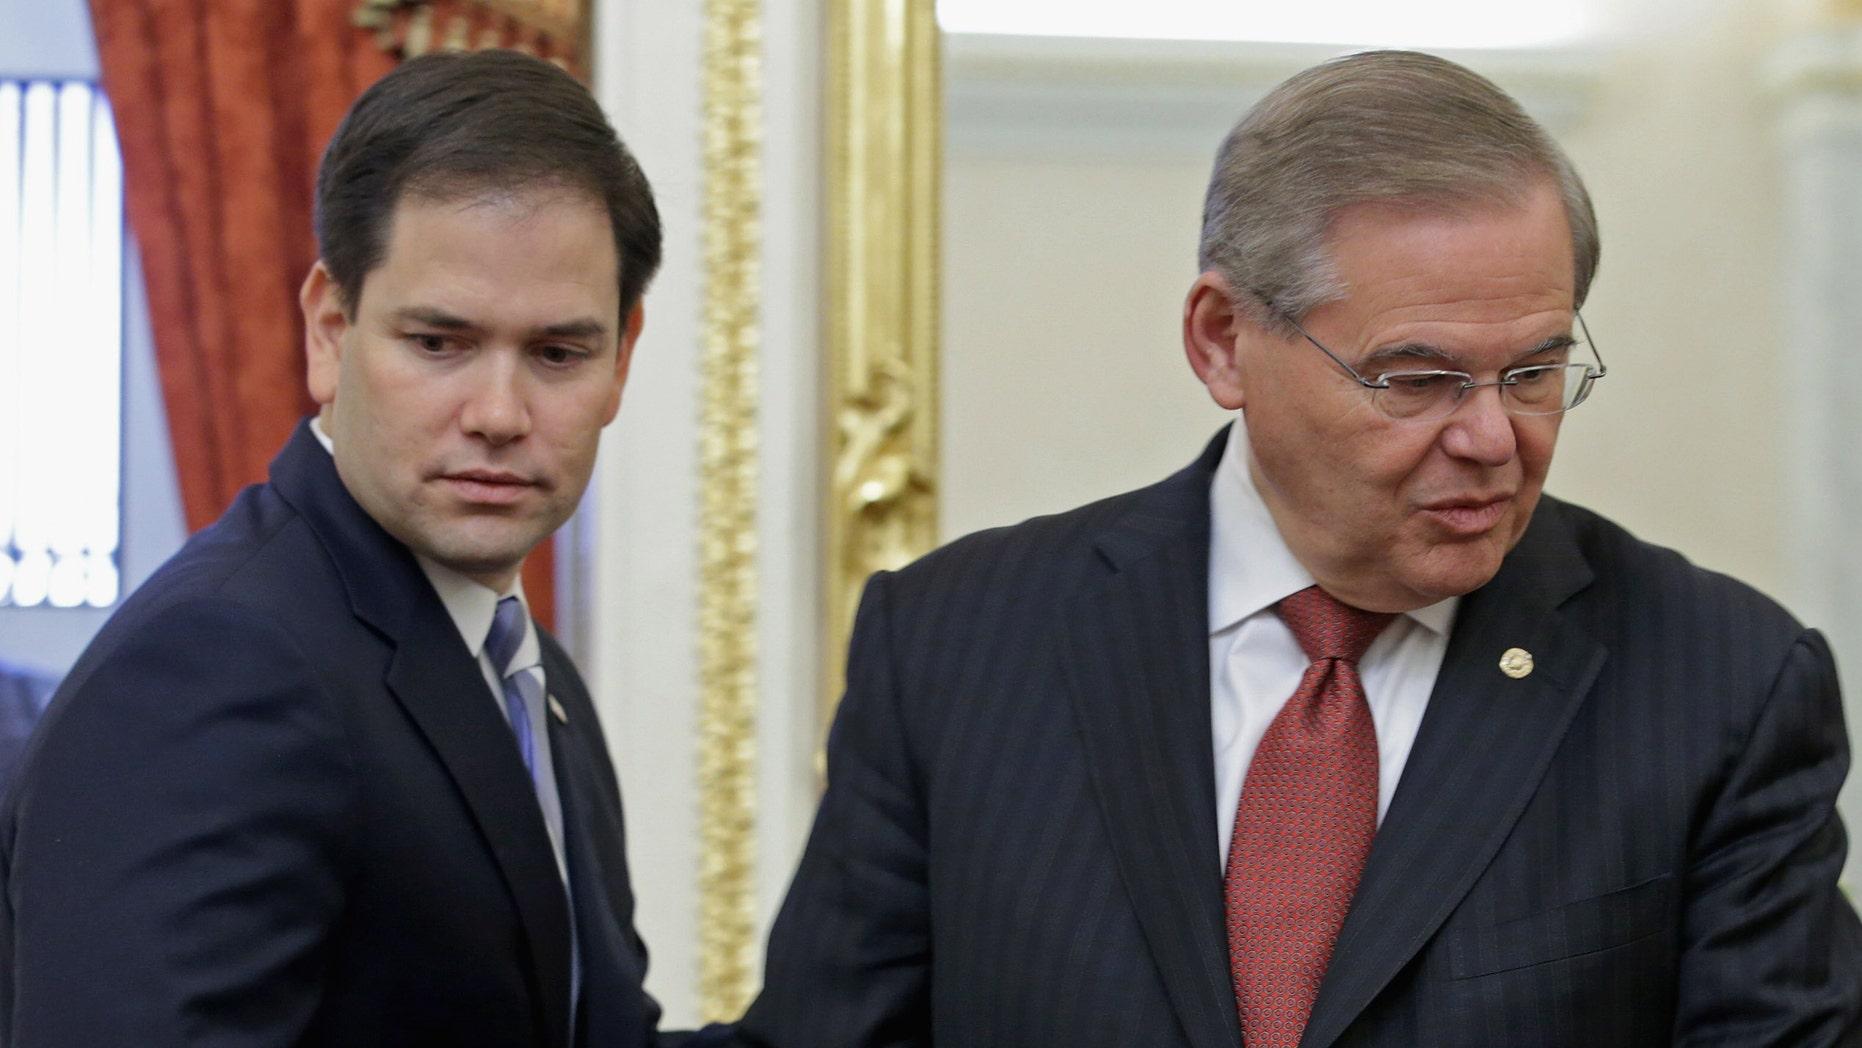 U.S. Sen. Marco Rubio (R-FL) and Senate Foreign Relations Committee Chairman Robert Menendez (D-NJ).